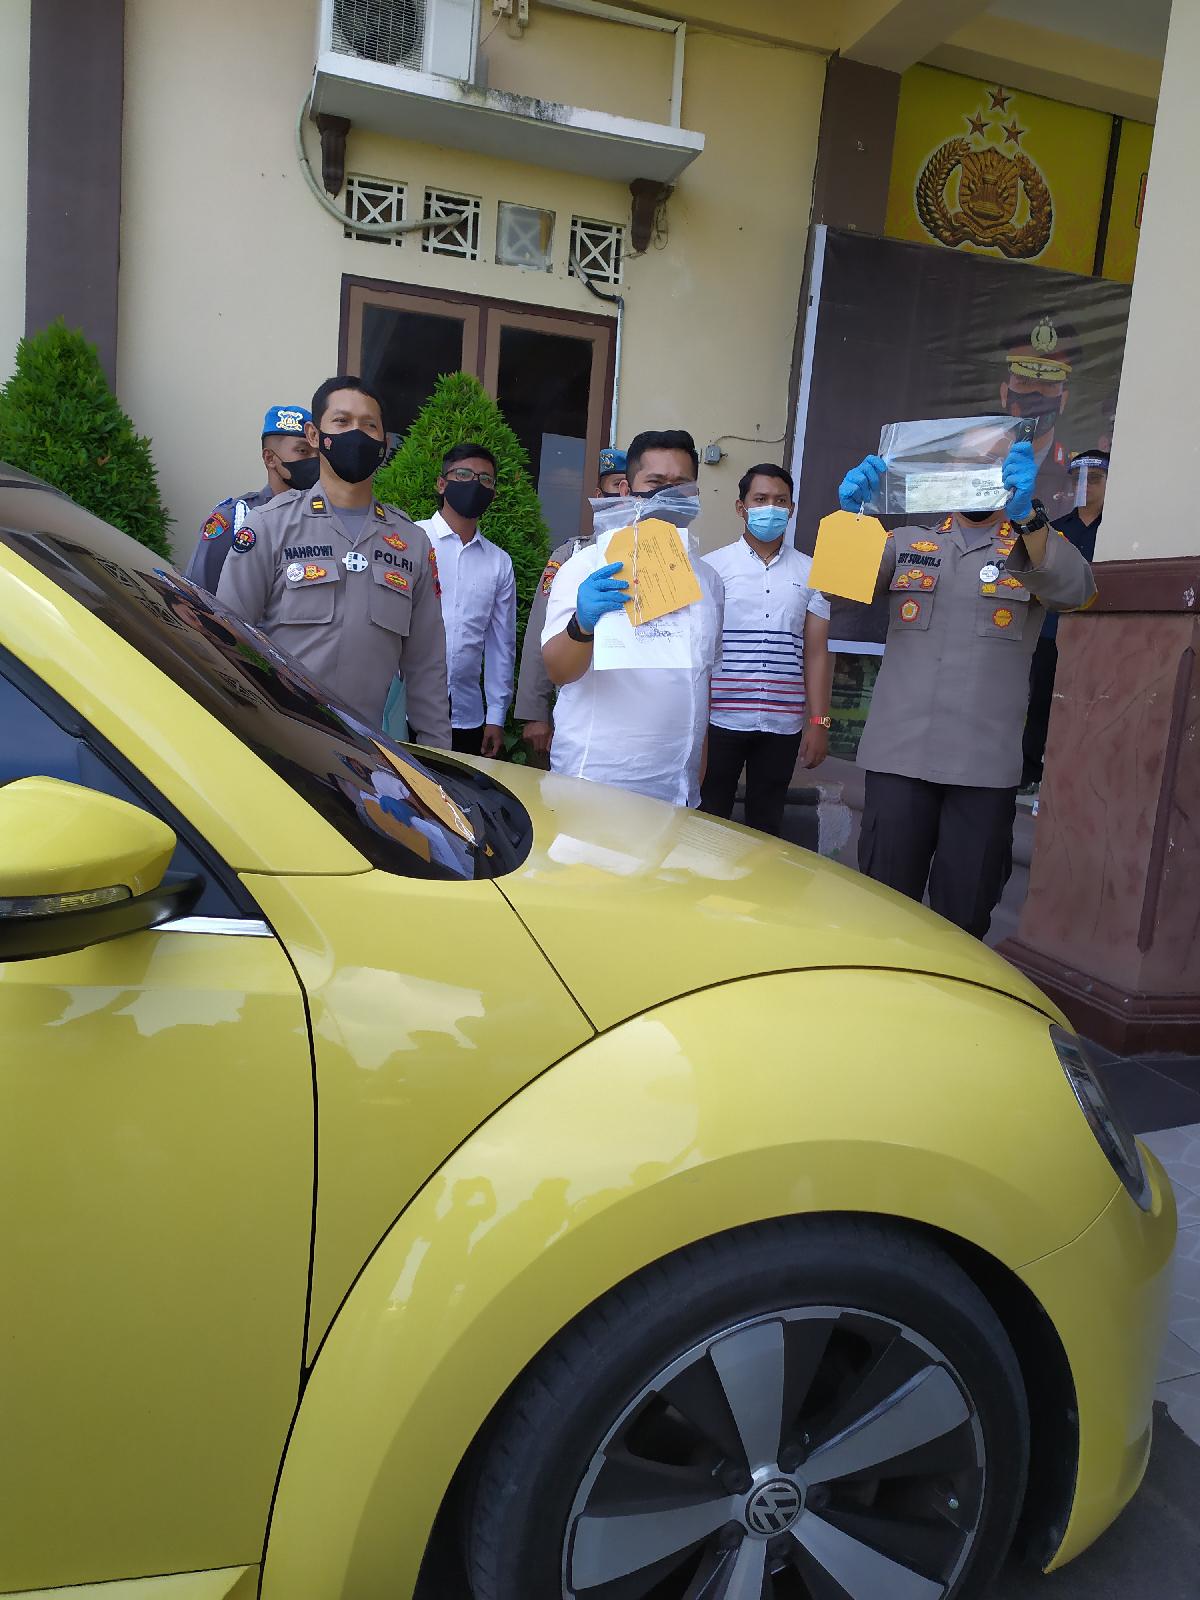 Takut Terkena Razia ABG 16 Tahun Pengemudi VW Kuning Nekat Terobos dan Tabrak Petugas Penyekatan Jalan Larangan Mudik